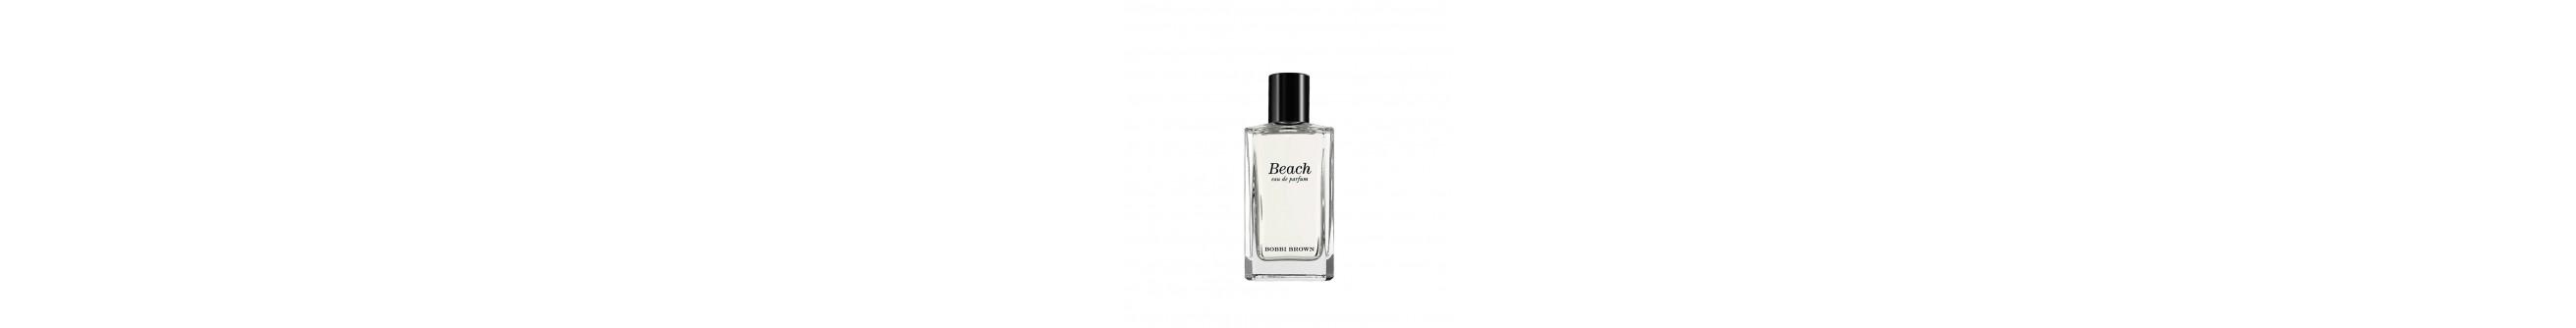 Beach - Bobbi Brown (άρωμα τύπου)